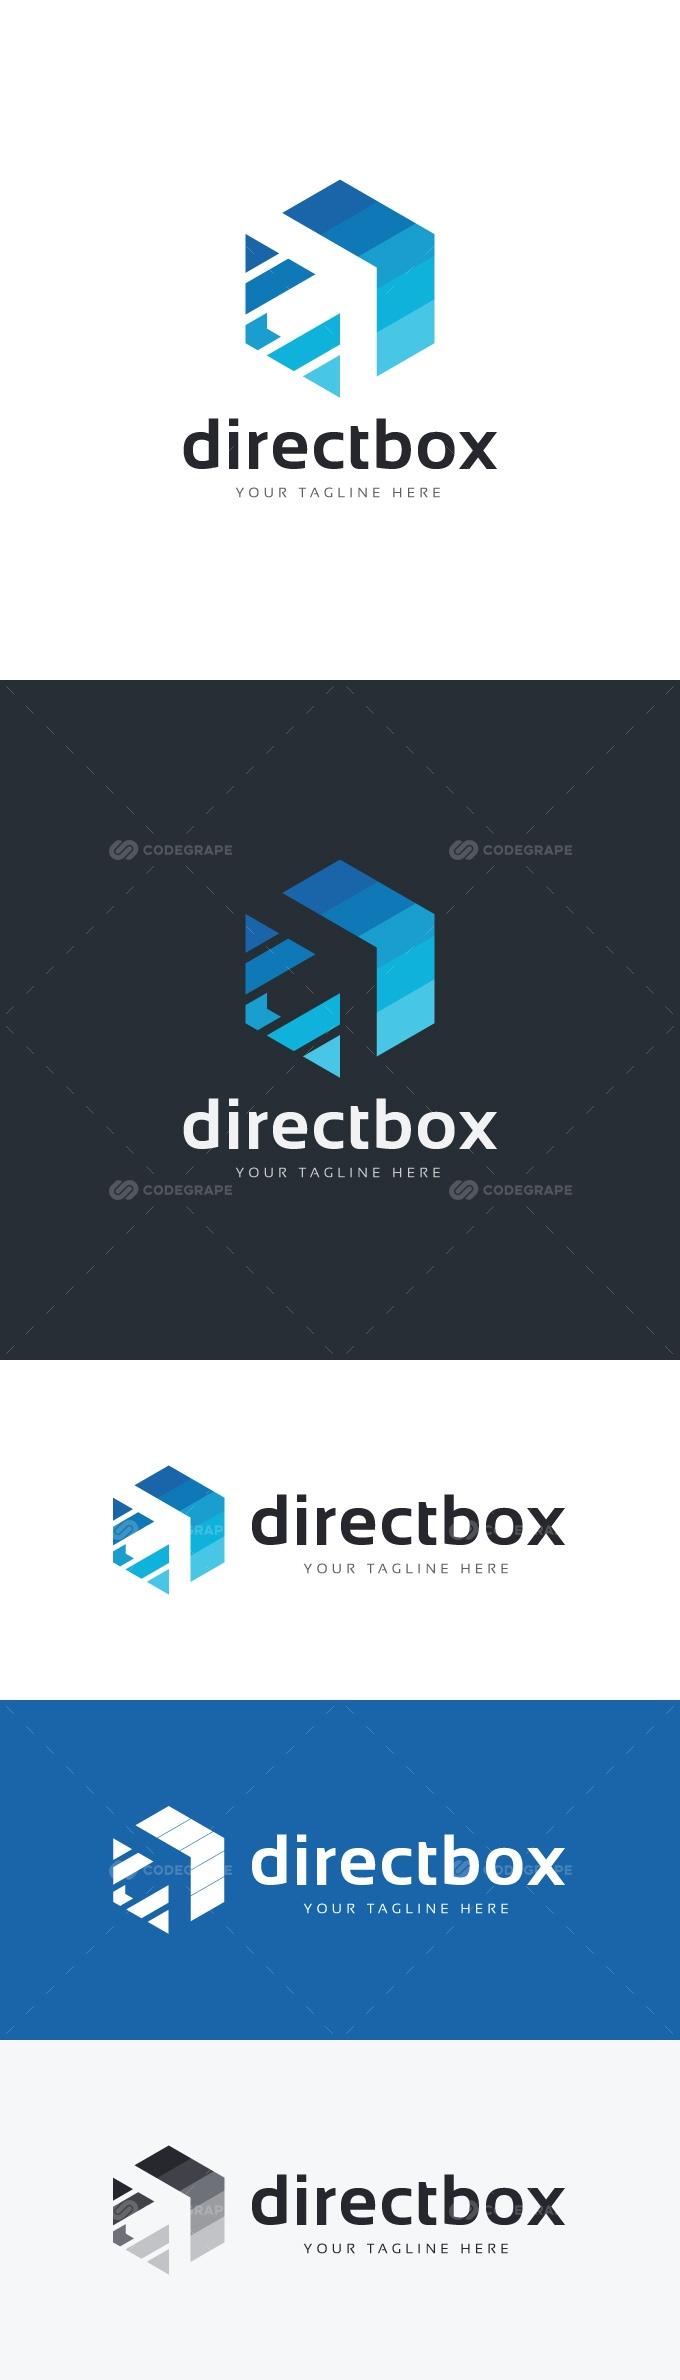 Direct Box Logo